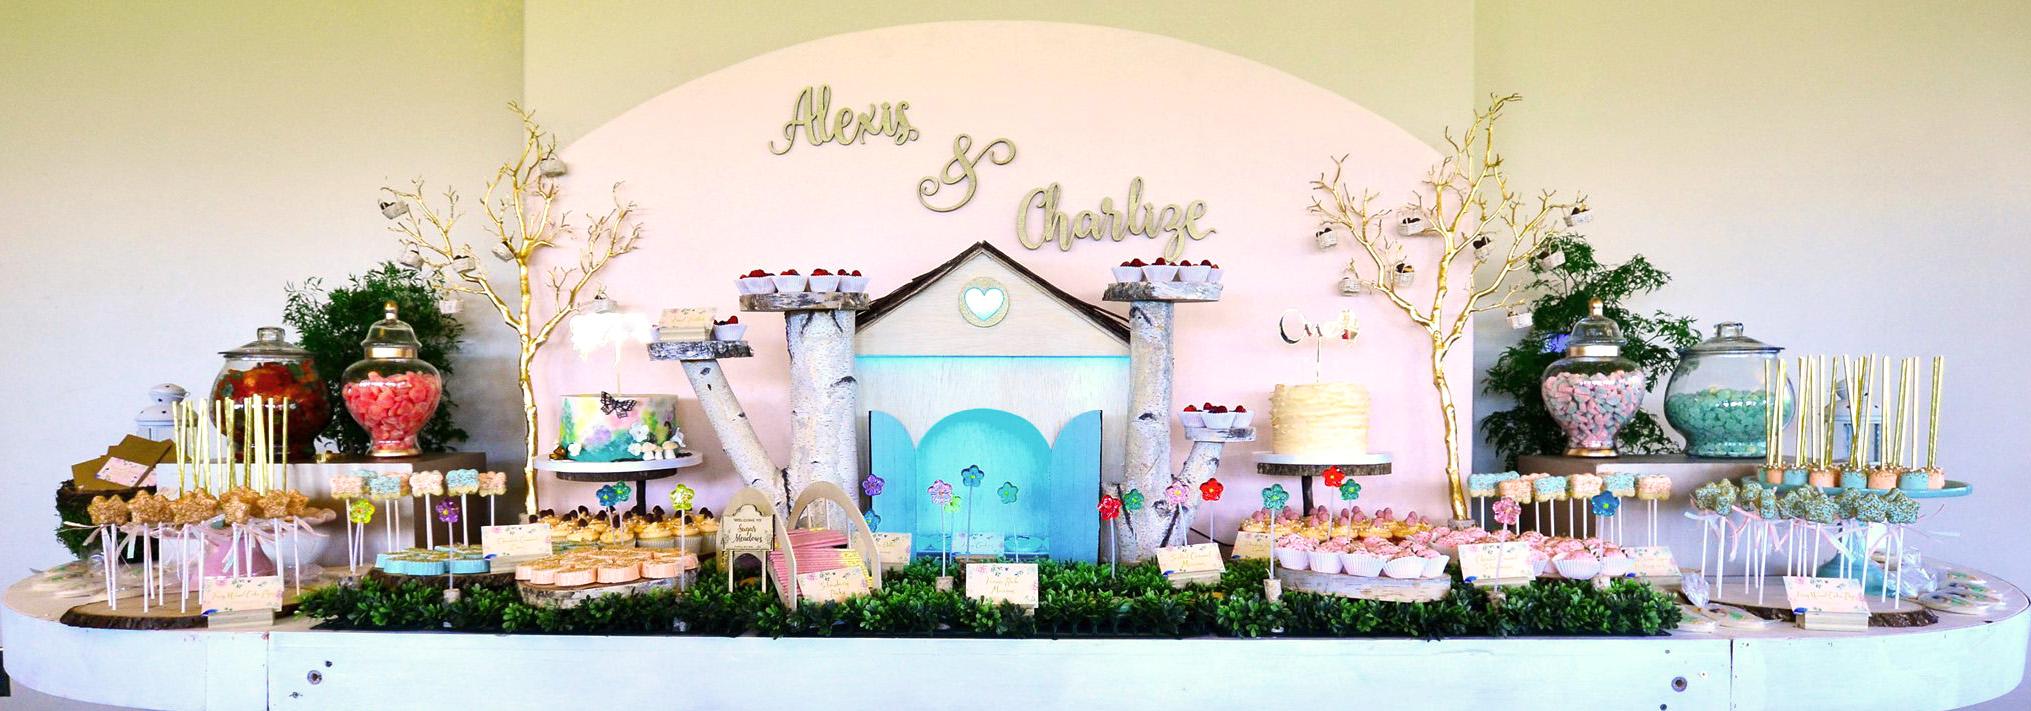 Fairyland Birthday